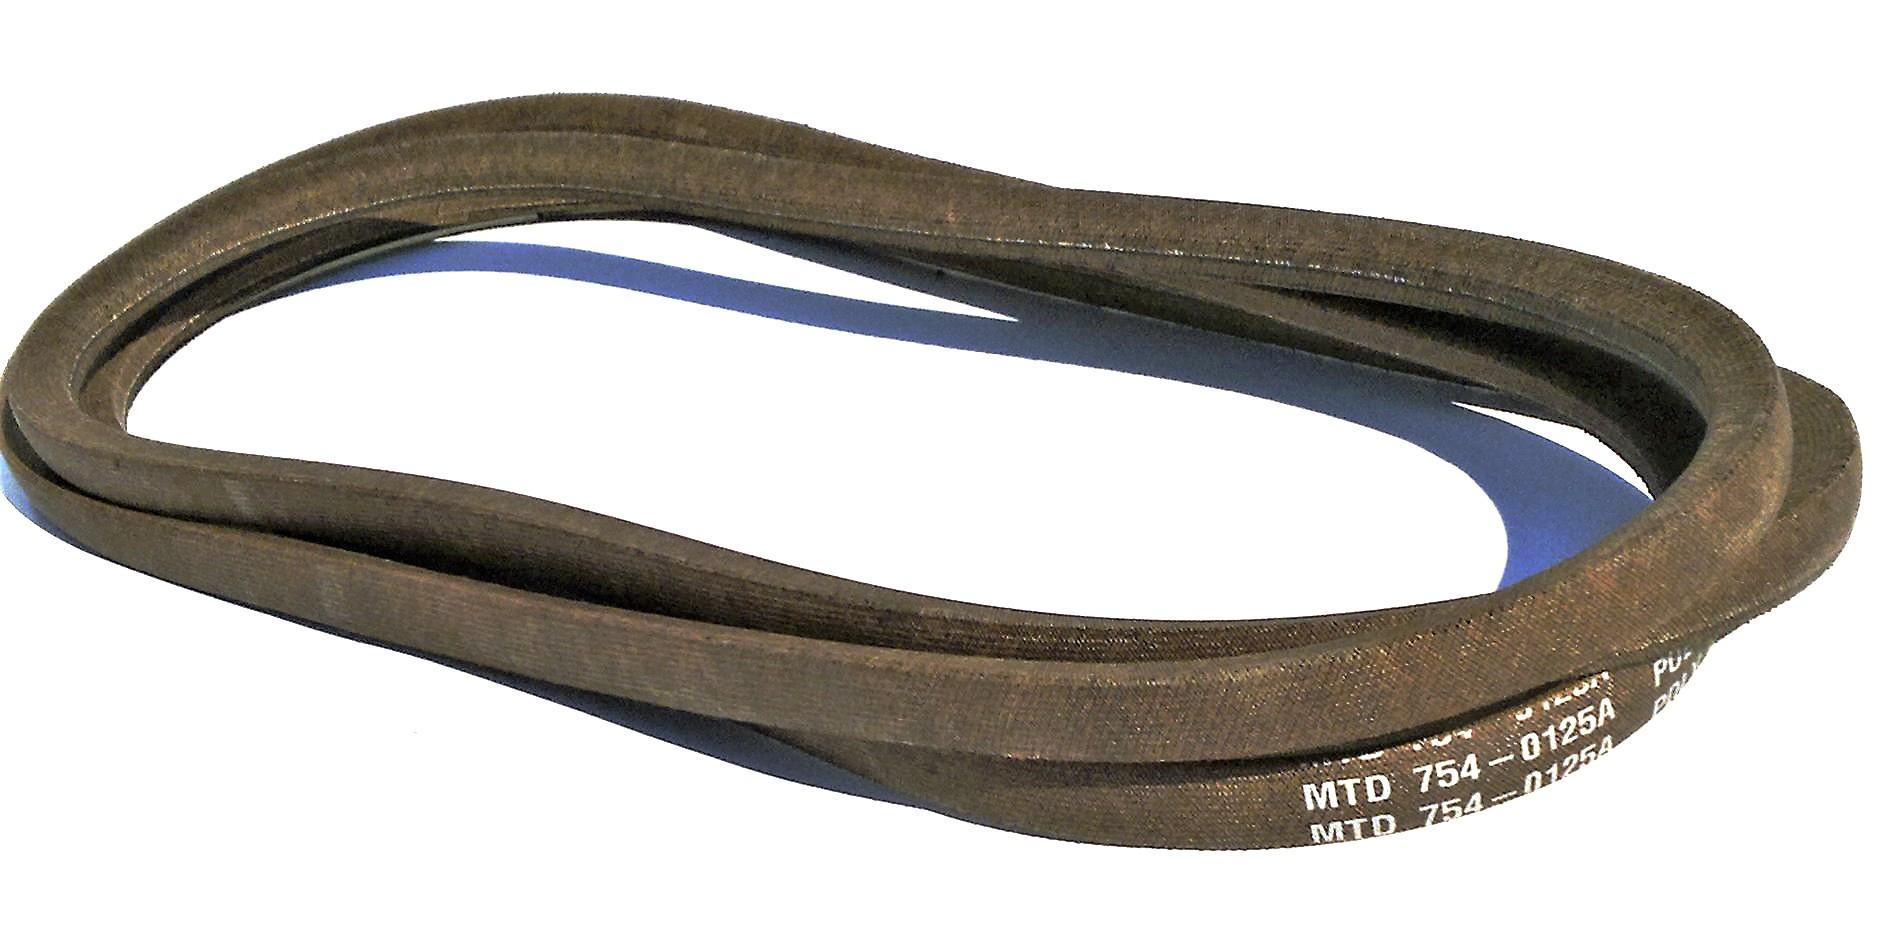 6, 8 oder 10 mm wählbar Joint Genie PROFESSIONAL Dübelbohrlehre Dübeln Dübel